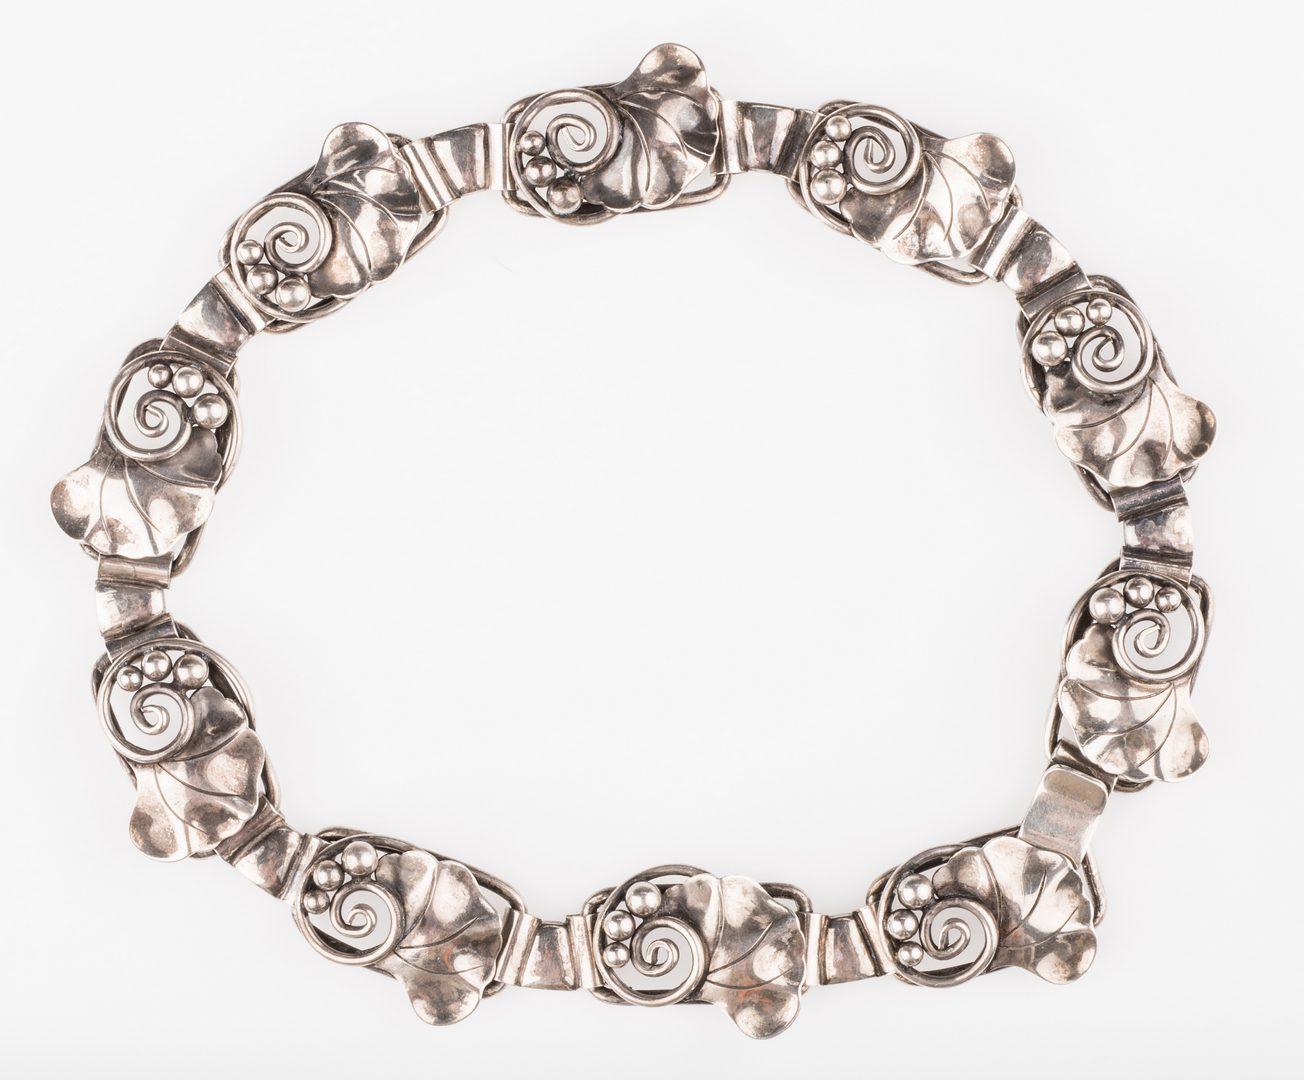 Lot 679: Lot Georg Jensen USA & LaPaglia Jewelry, 6 pieces